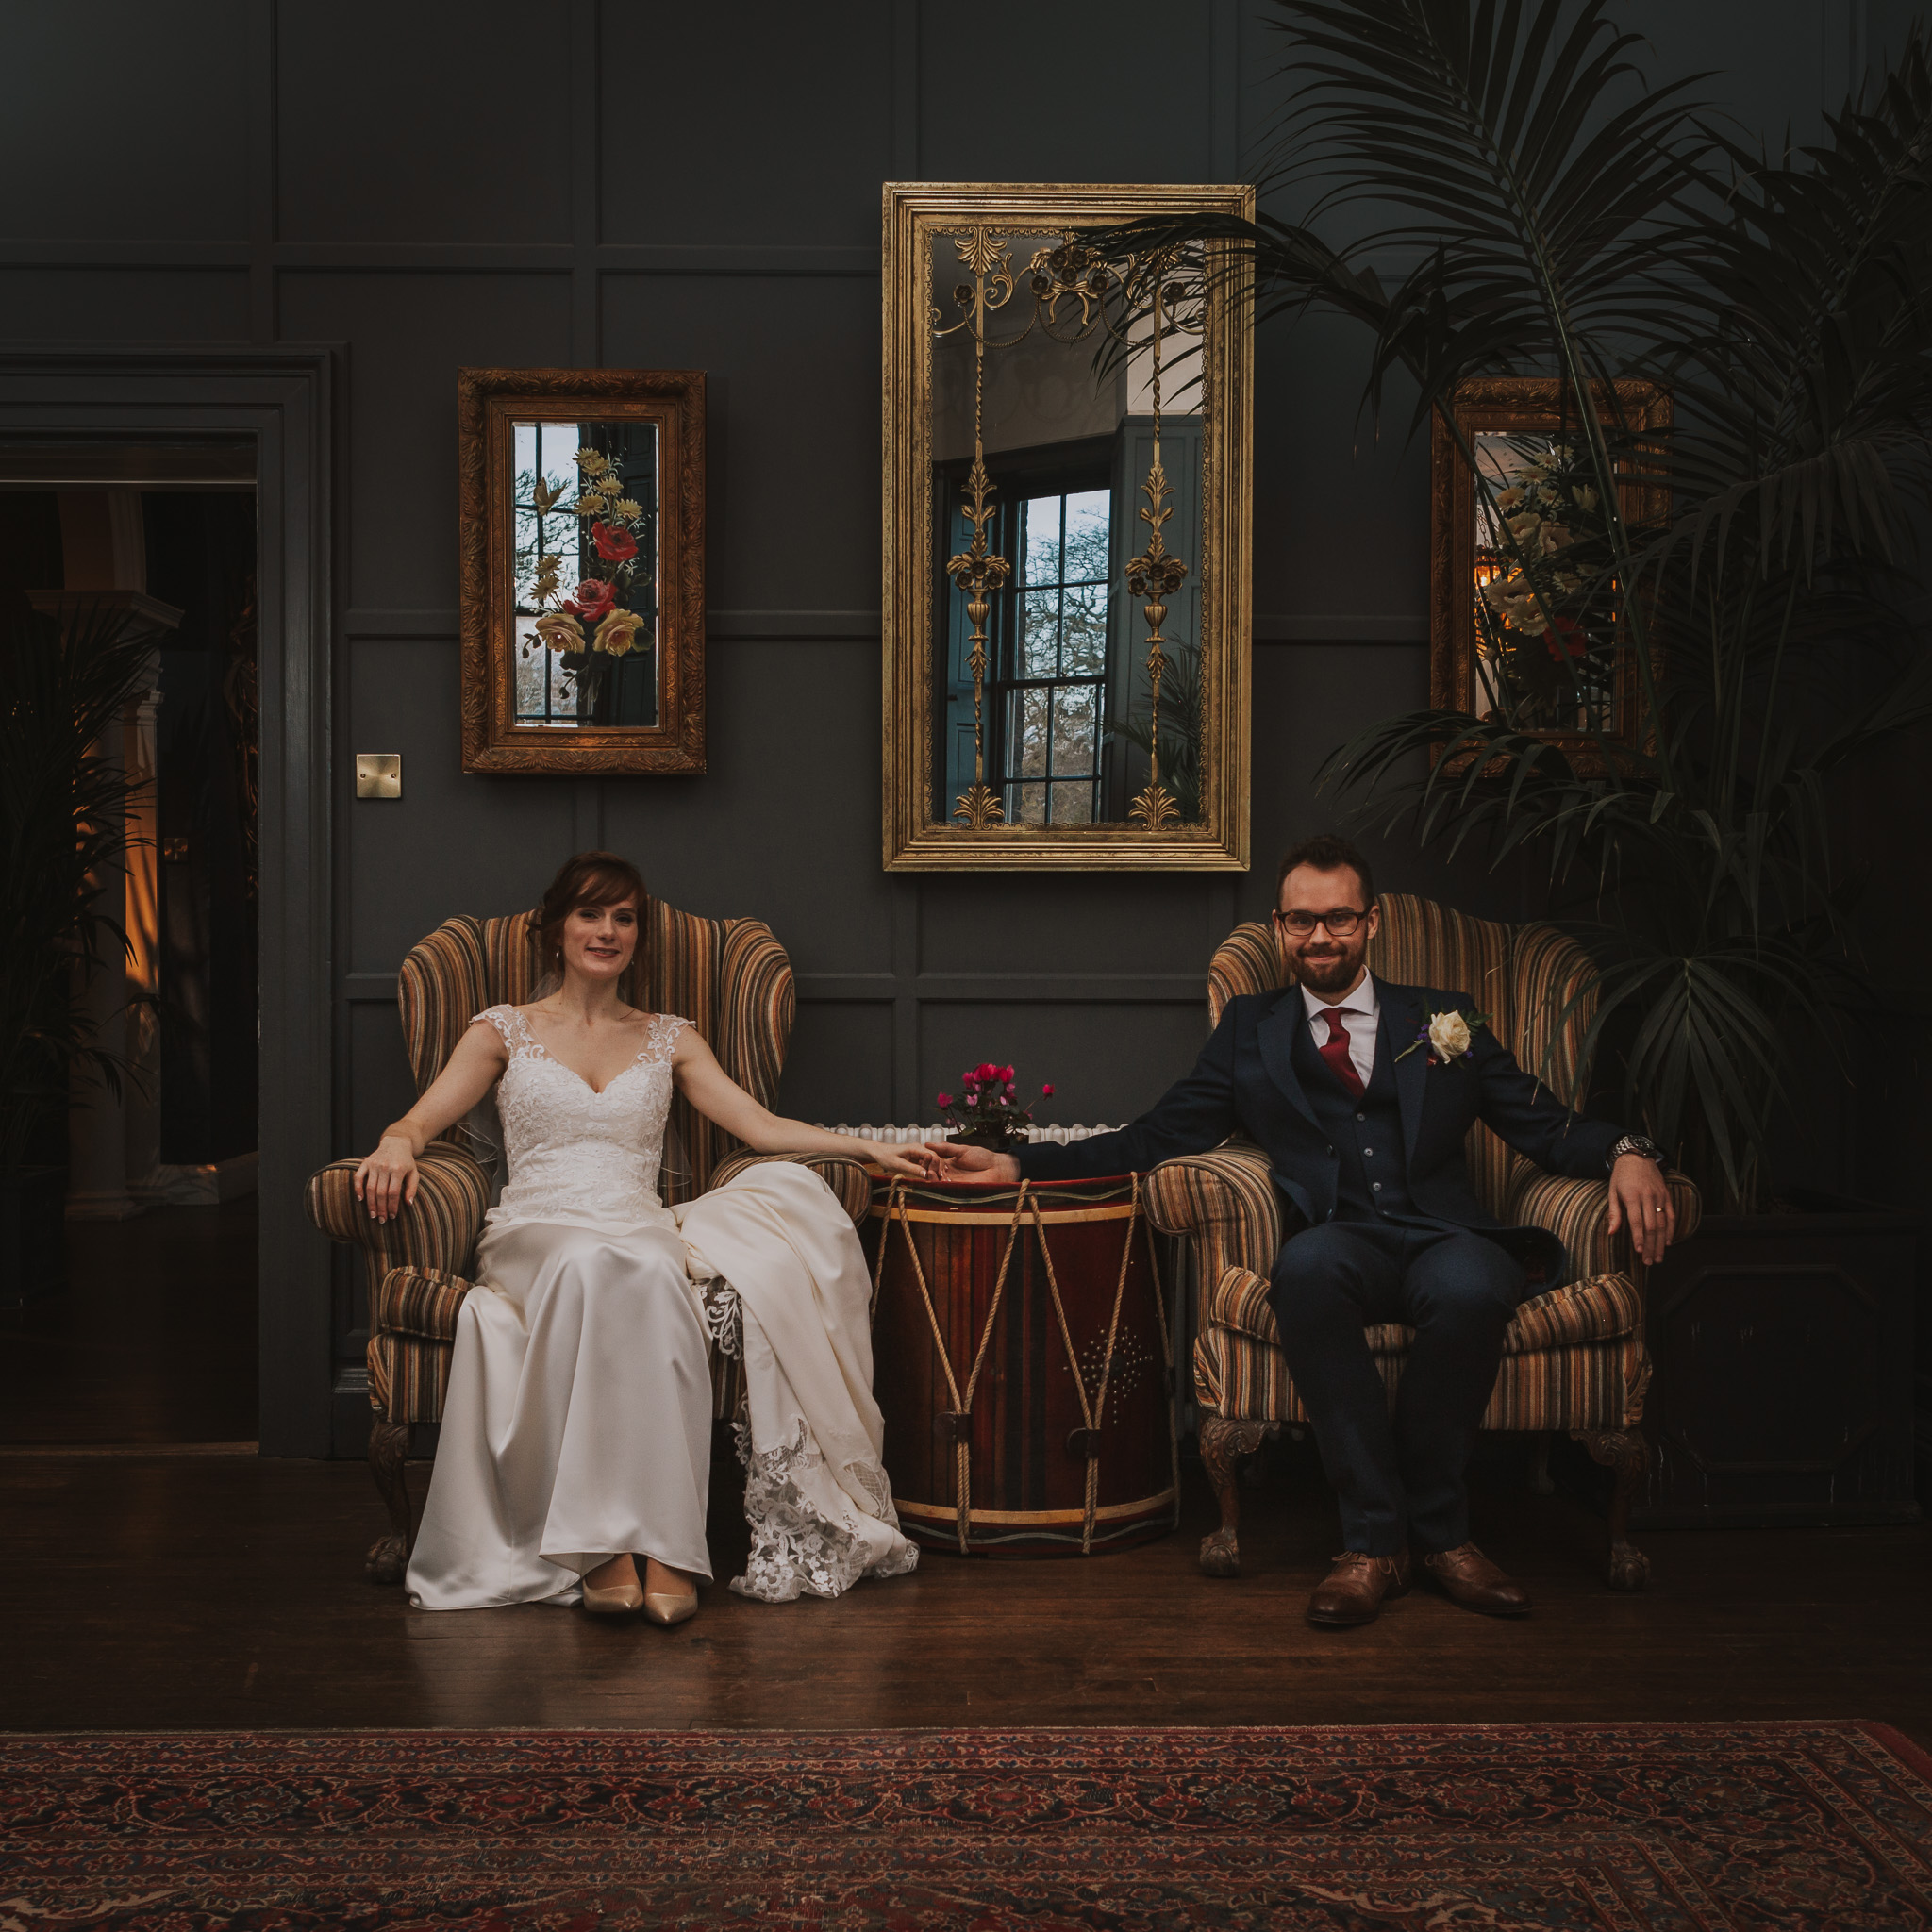 short wedding photo package